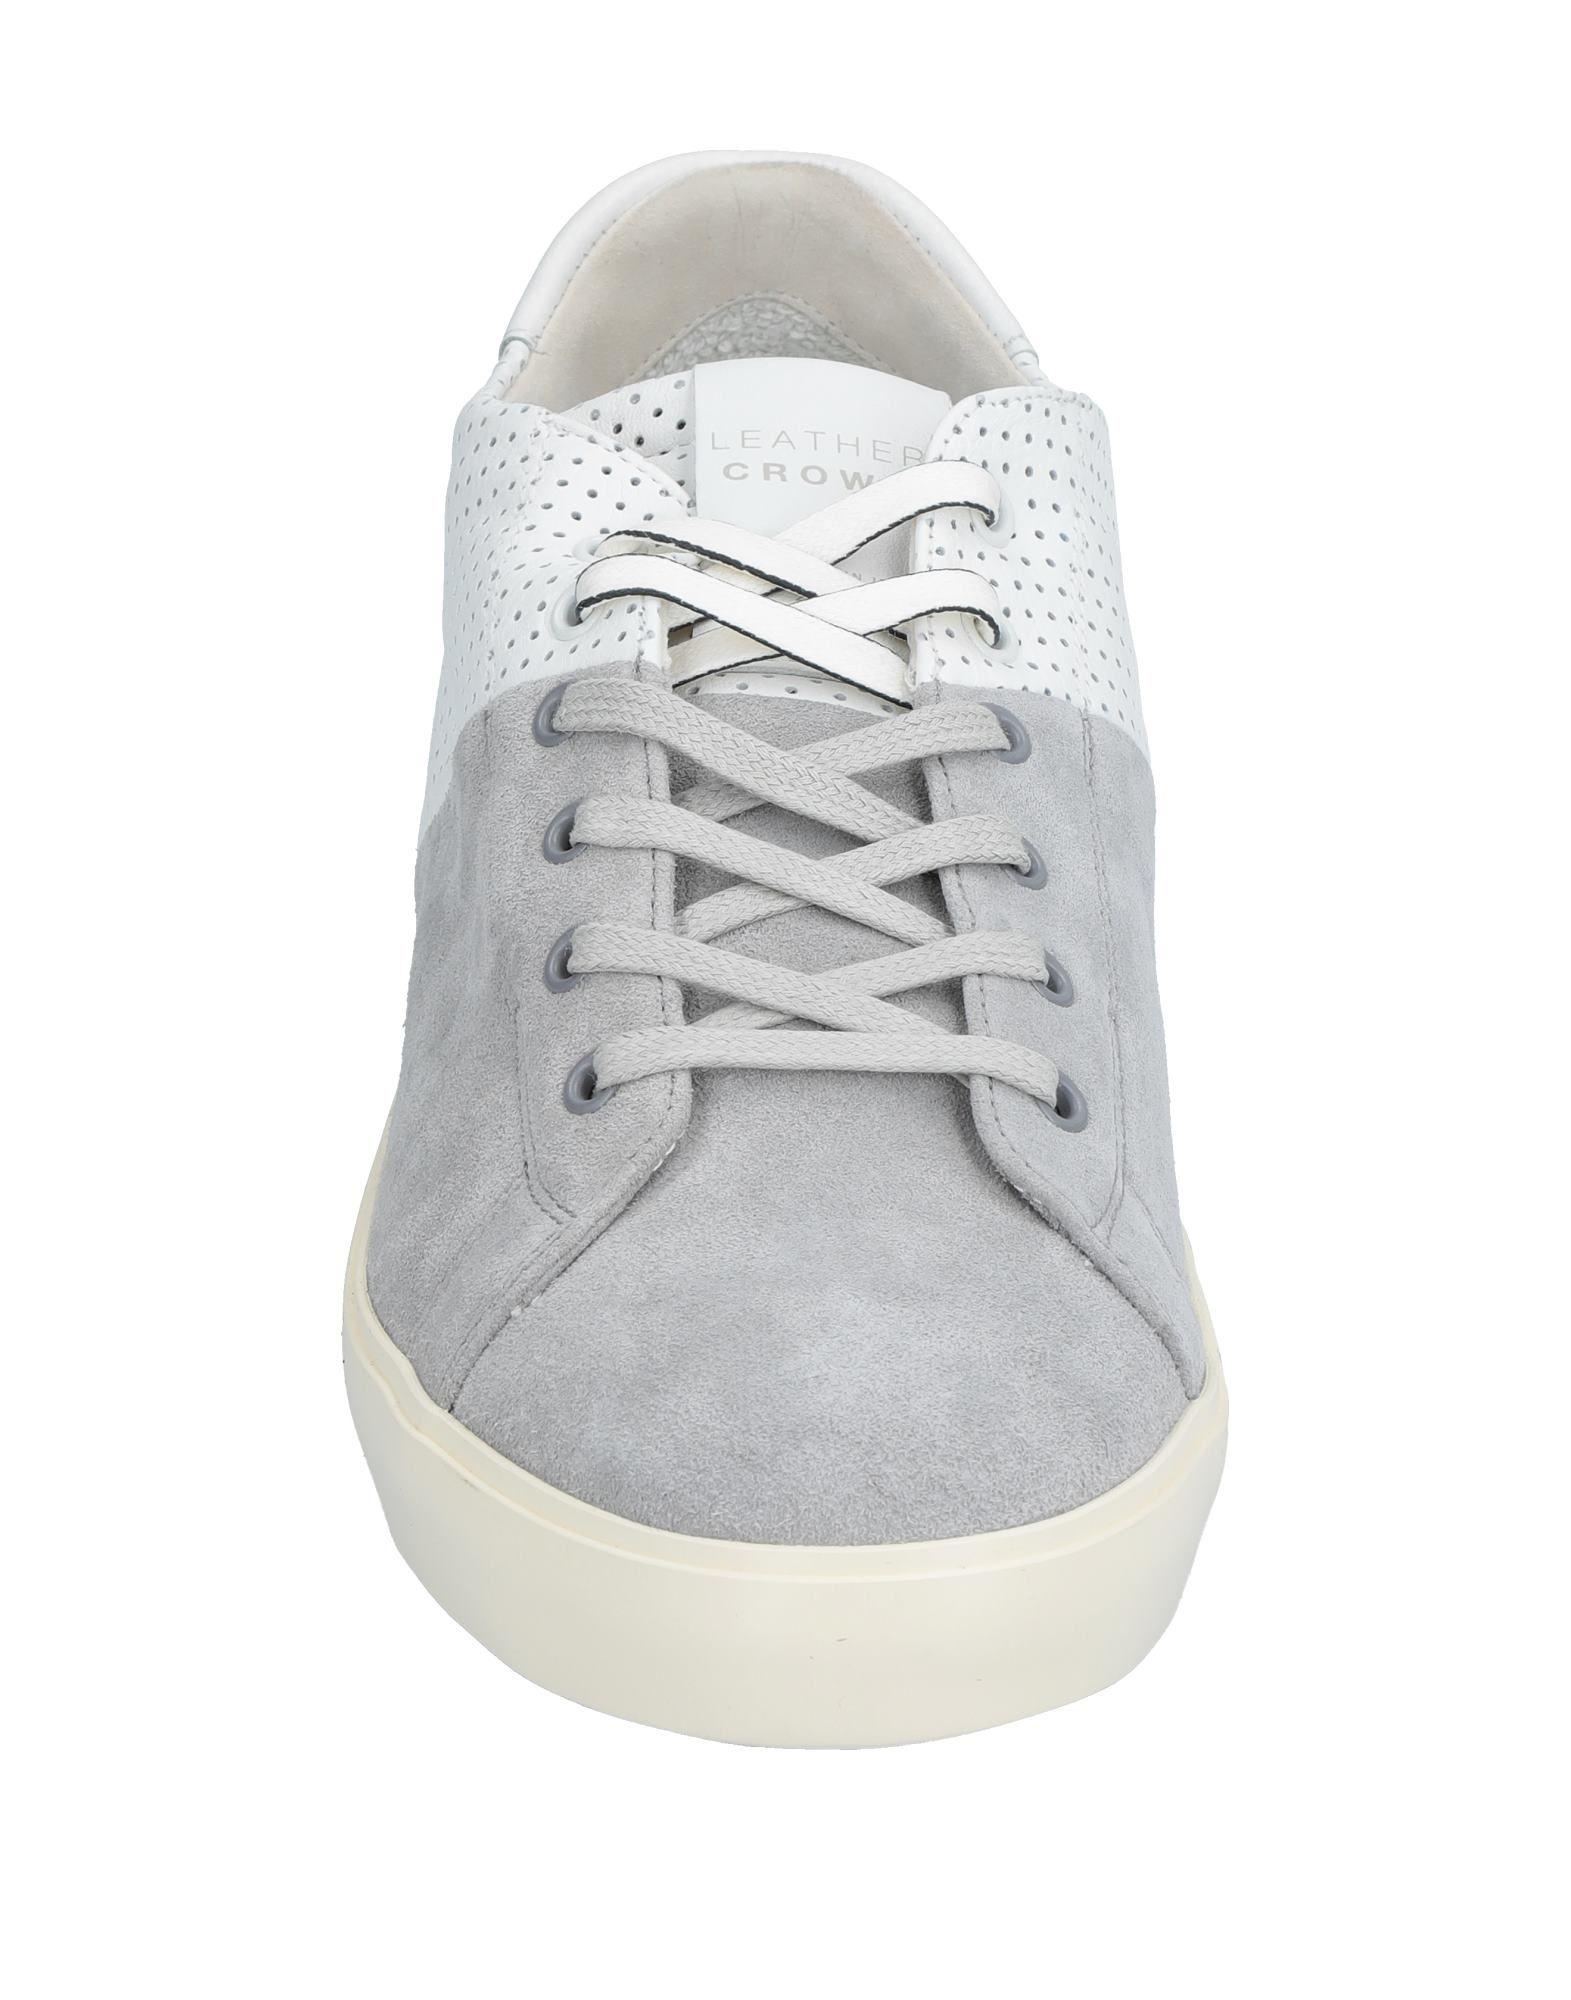 Leather Schuhe Crown Sneakers Herren  11536297FV Neue Schuhe Leather 2ec760